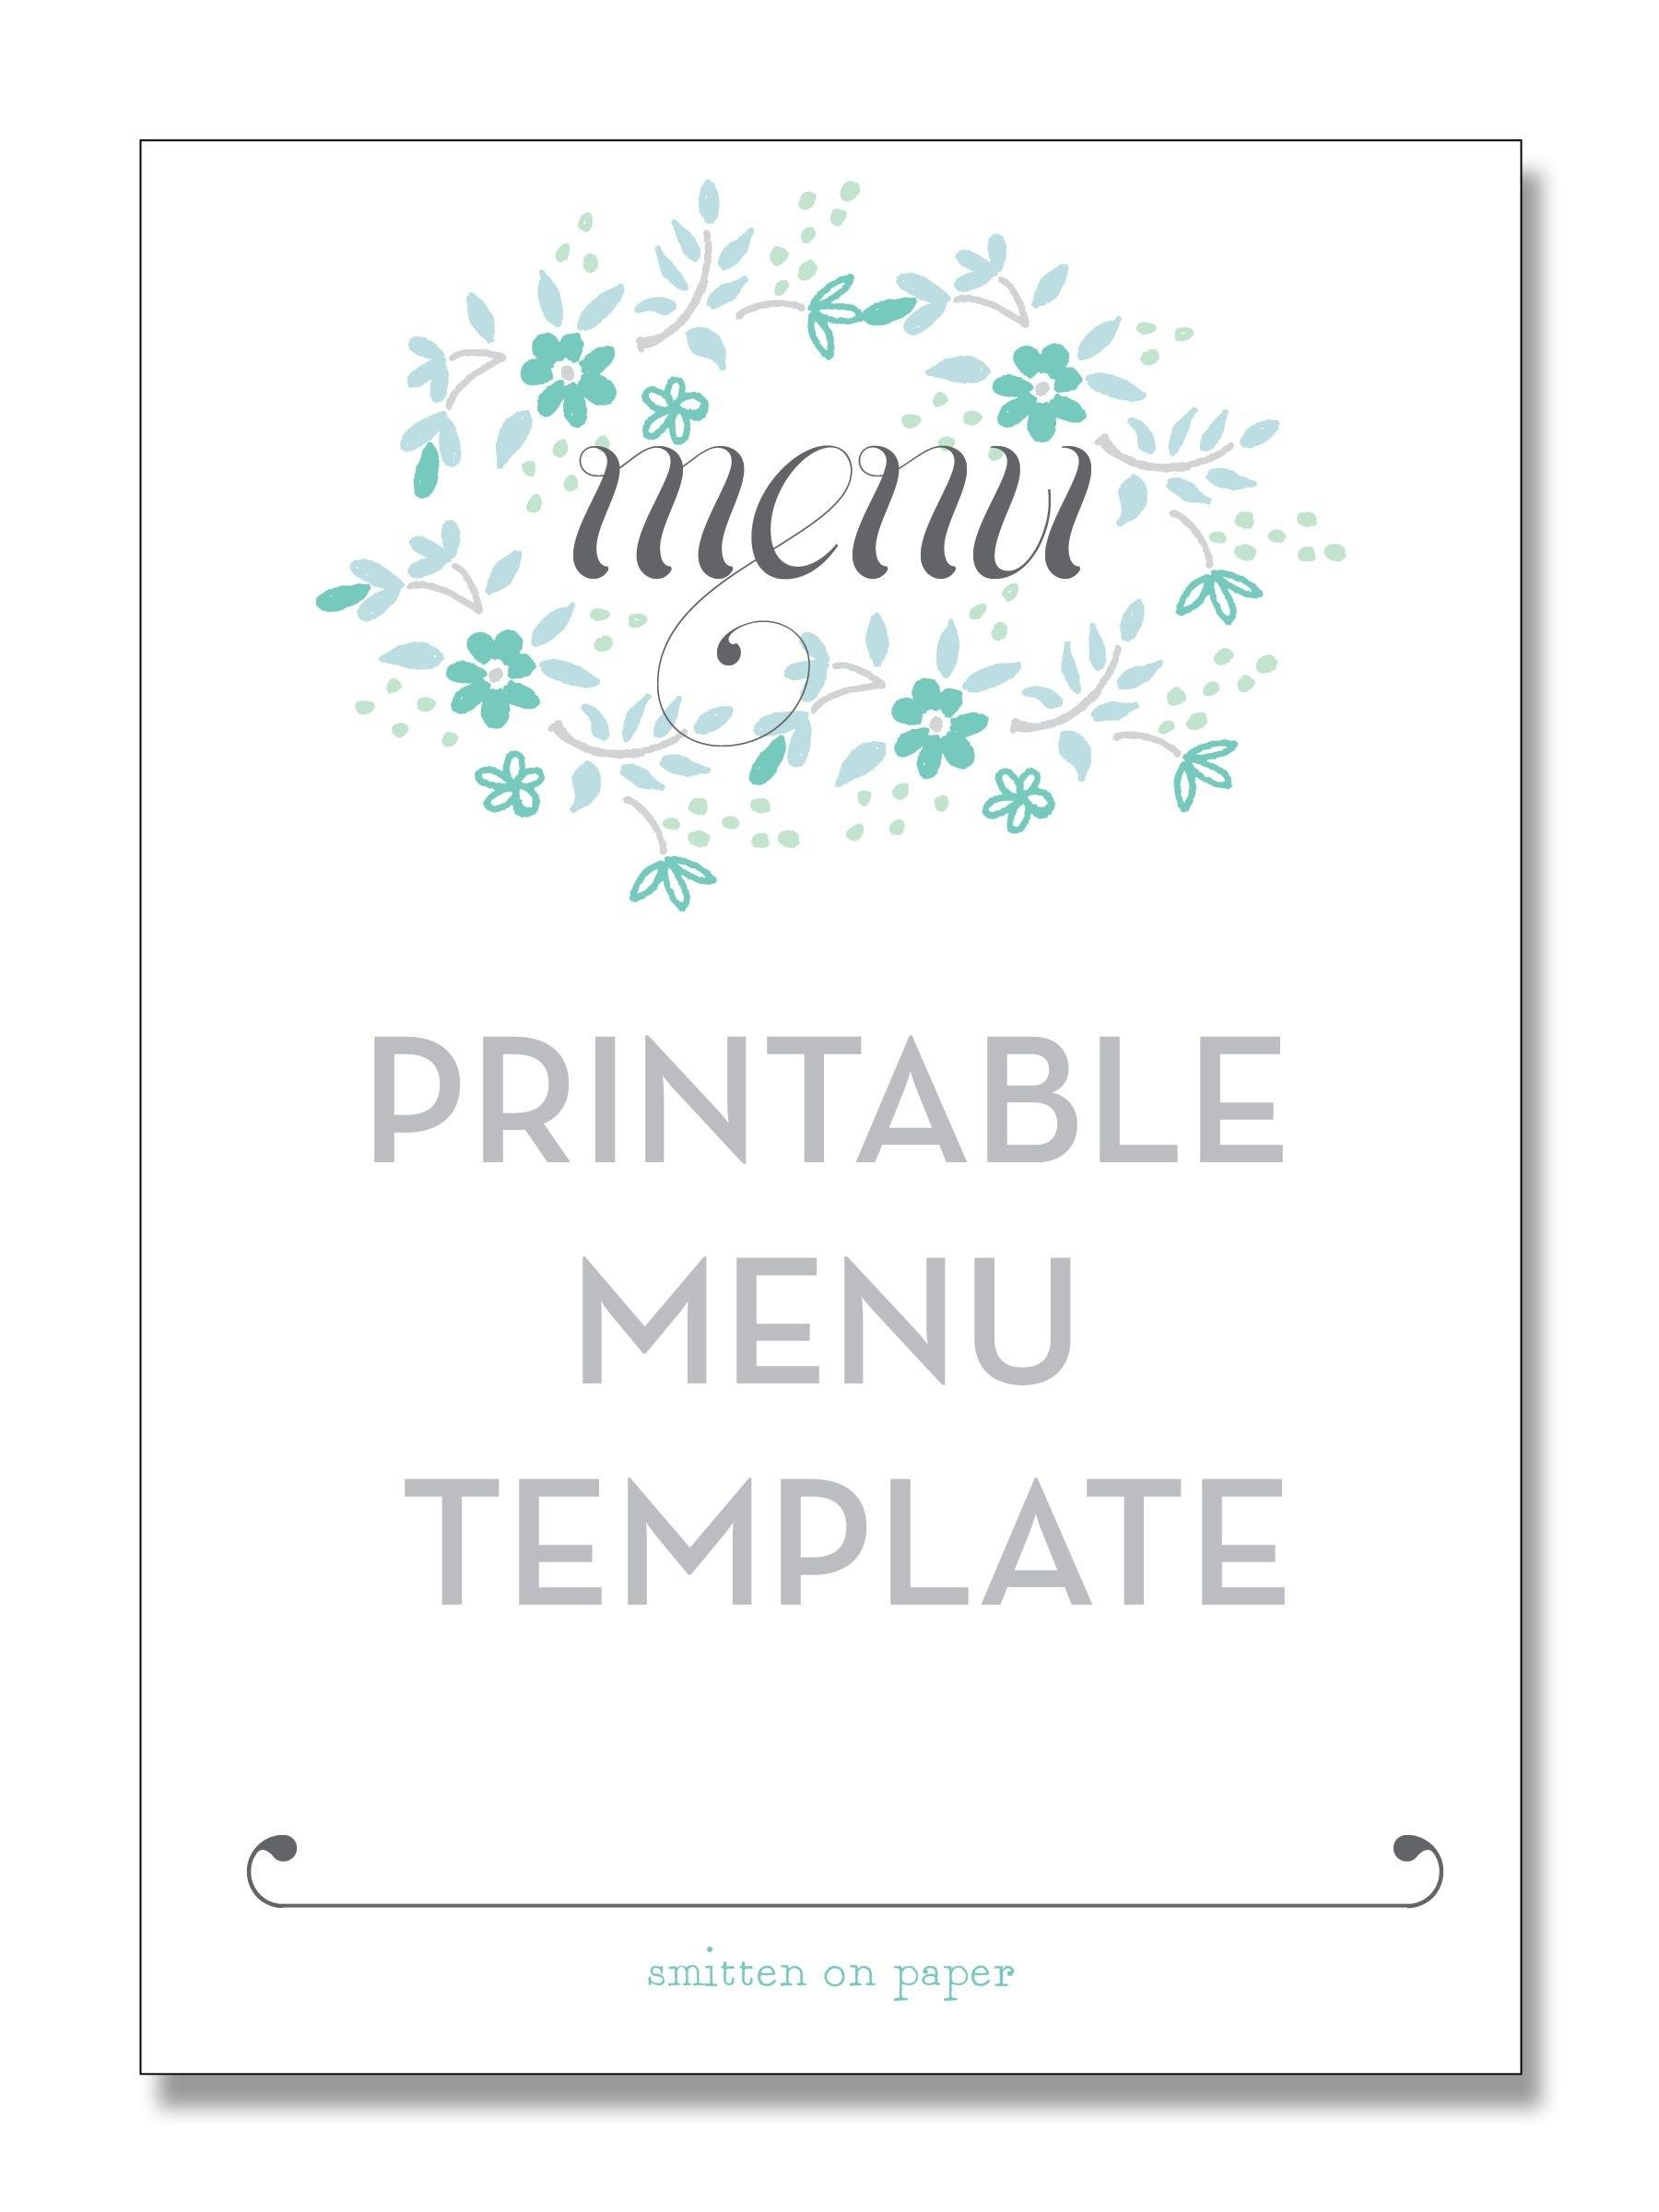 Freebie Friday Printable Menu  Party Time  Printable Menu Menu For Menu Template Free Printable